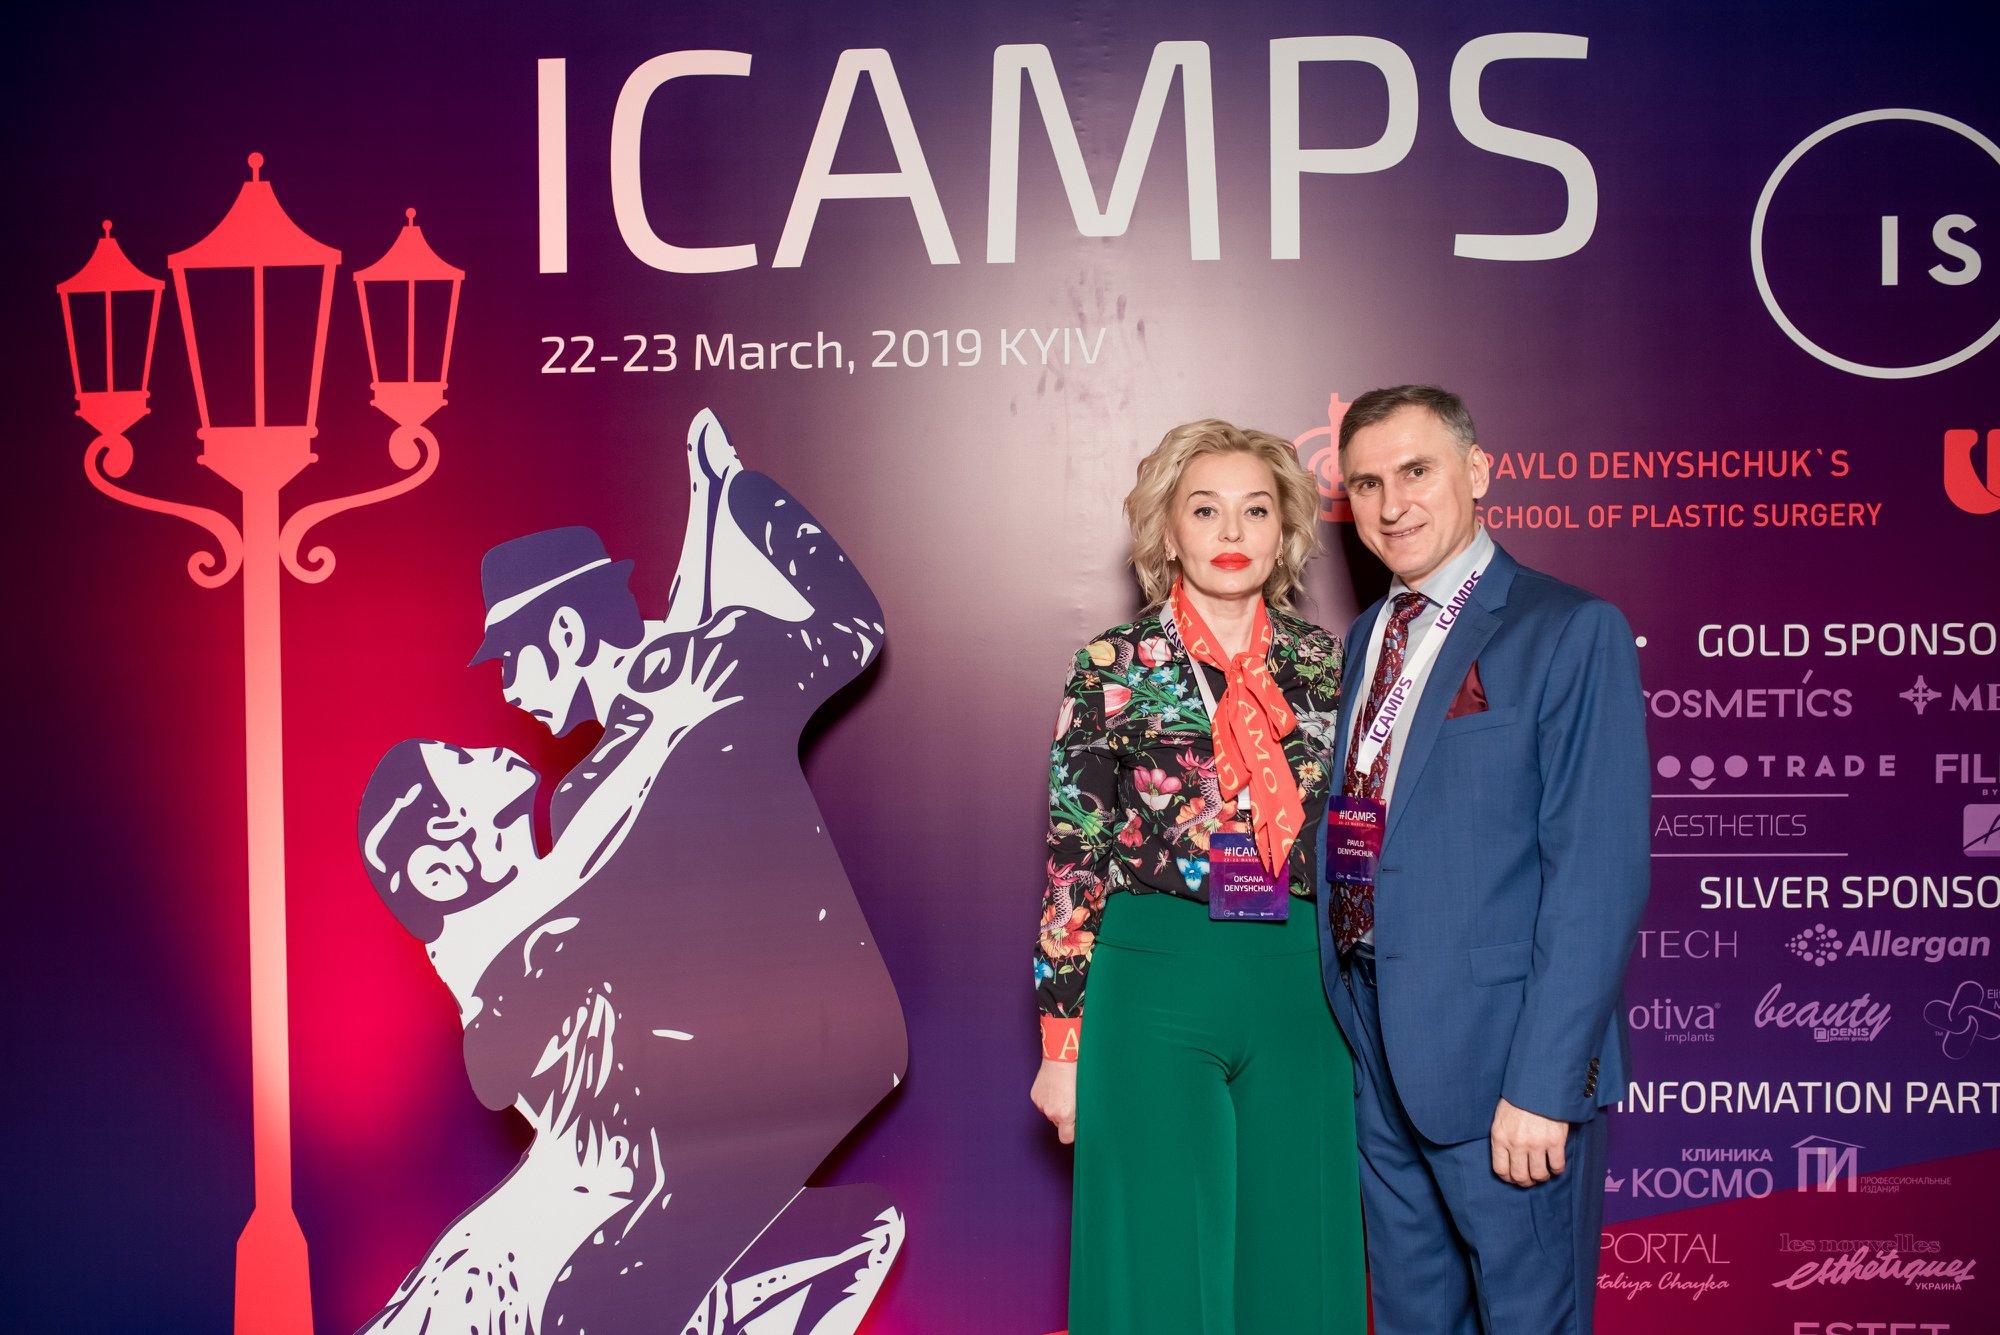 АНА-КОСМО провела 2-й конгрес ICAMPS